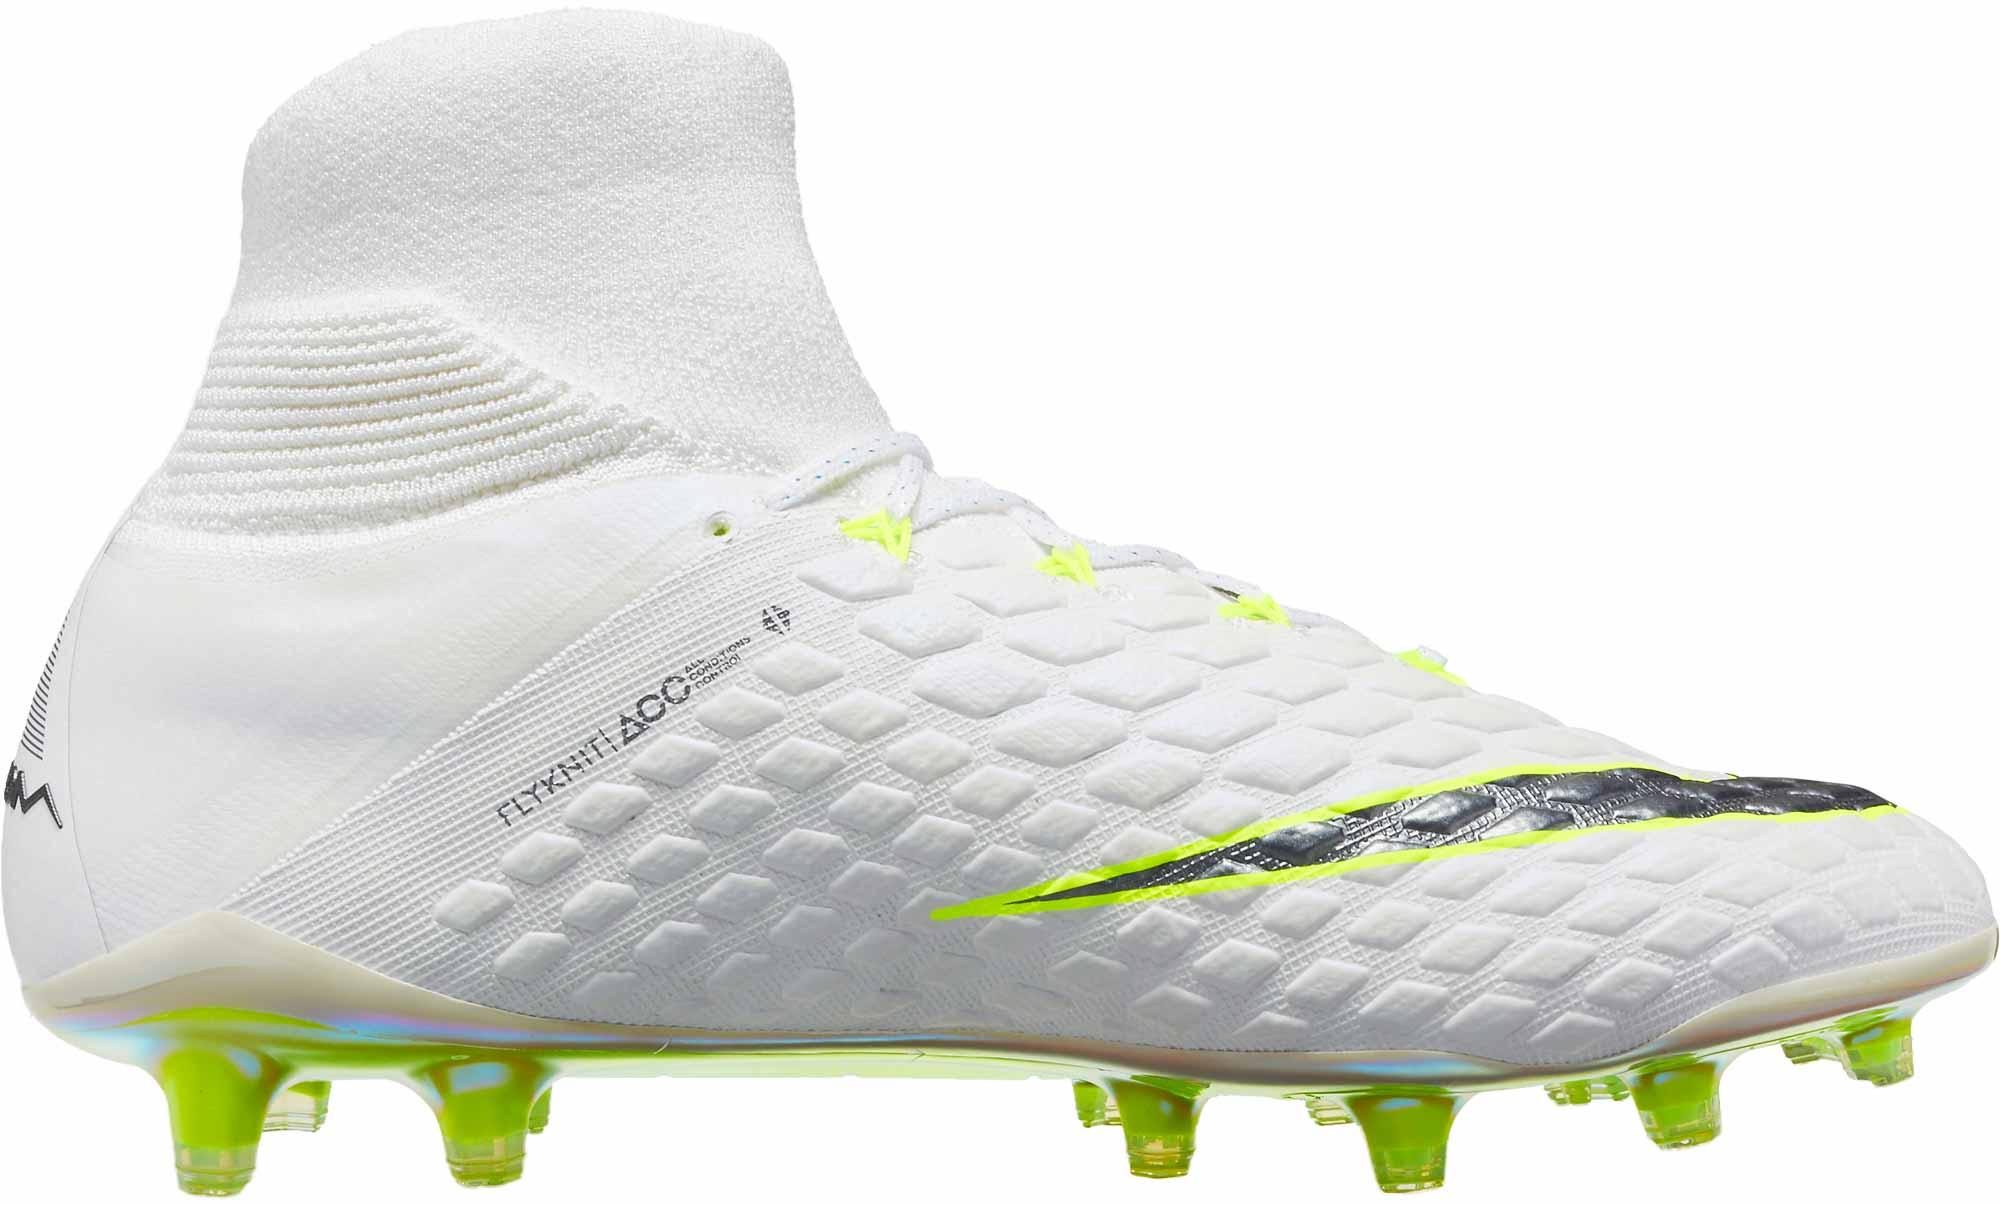 30cc4915e92 Home   Shop By Brand   Nike Soccer   Nike Soccer Shoes   Nike Hypervenom  Phantom III ...